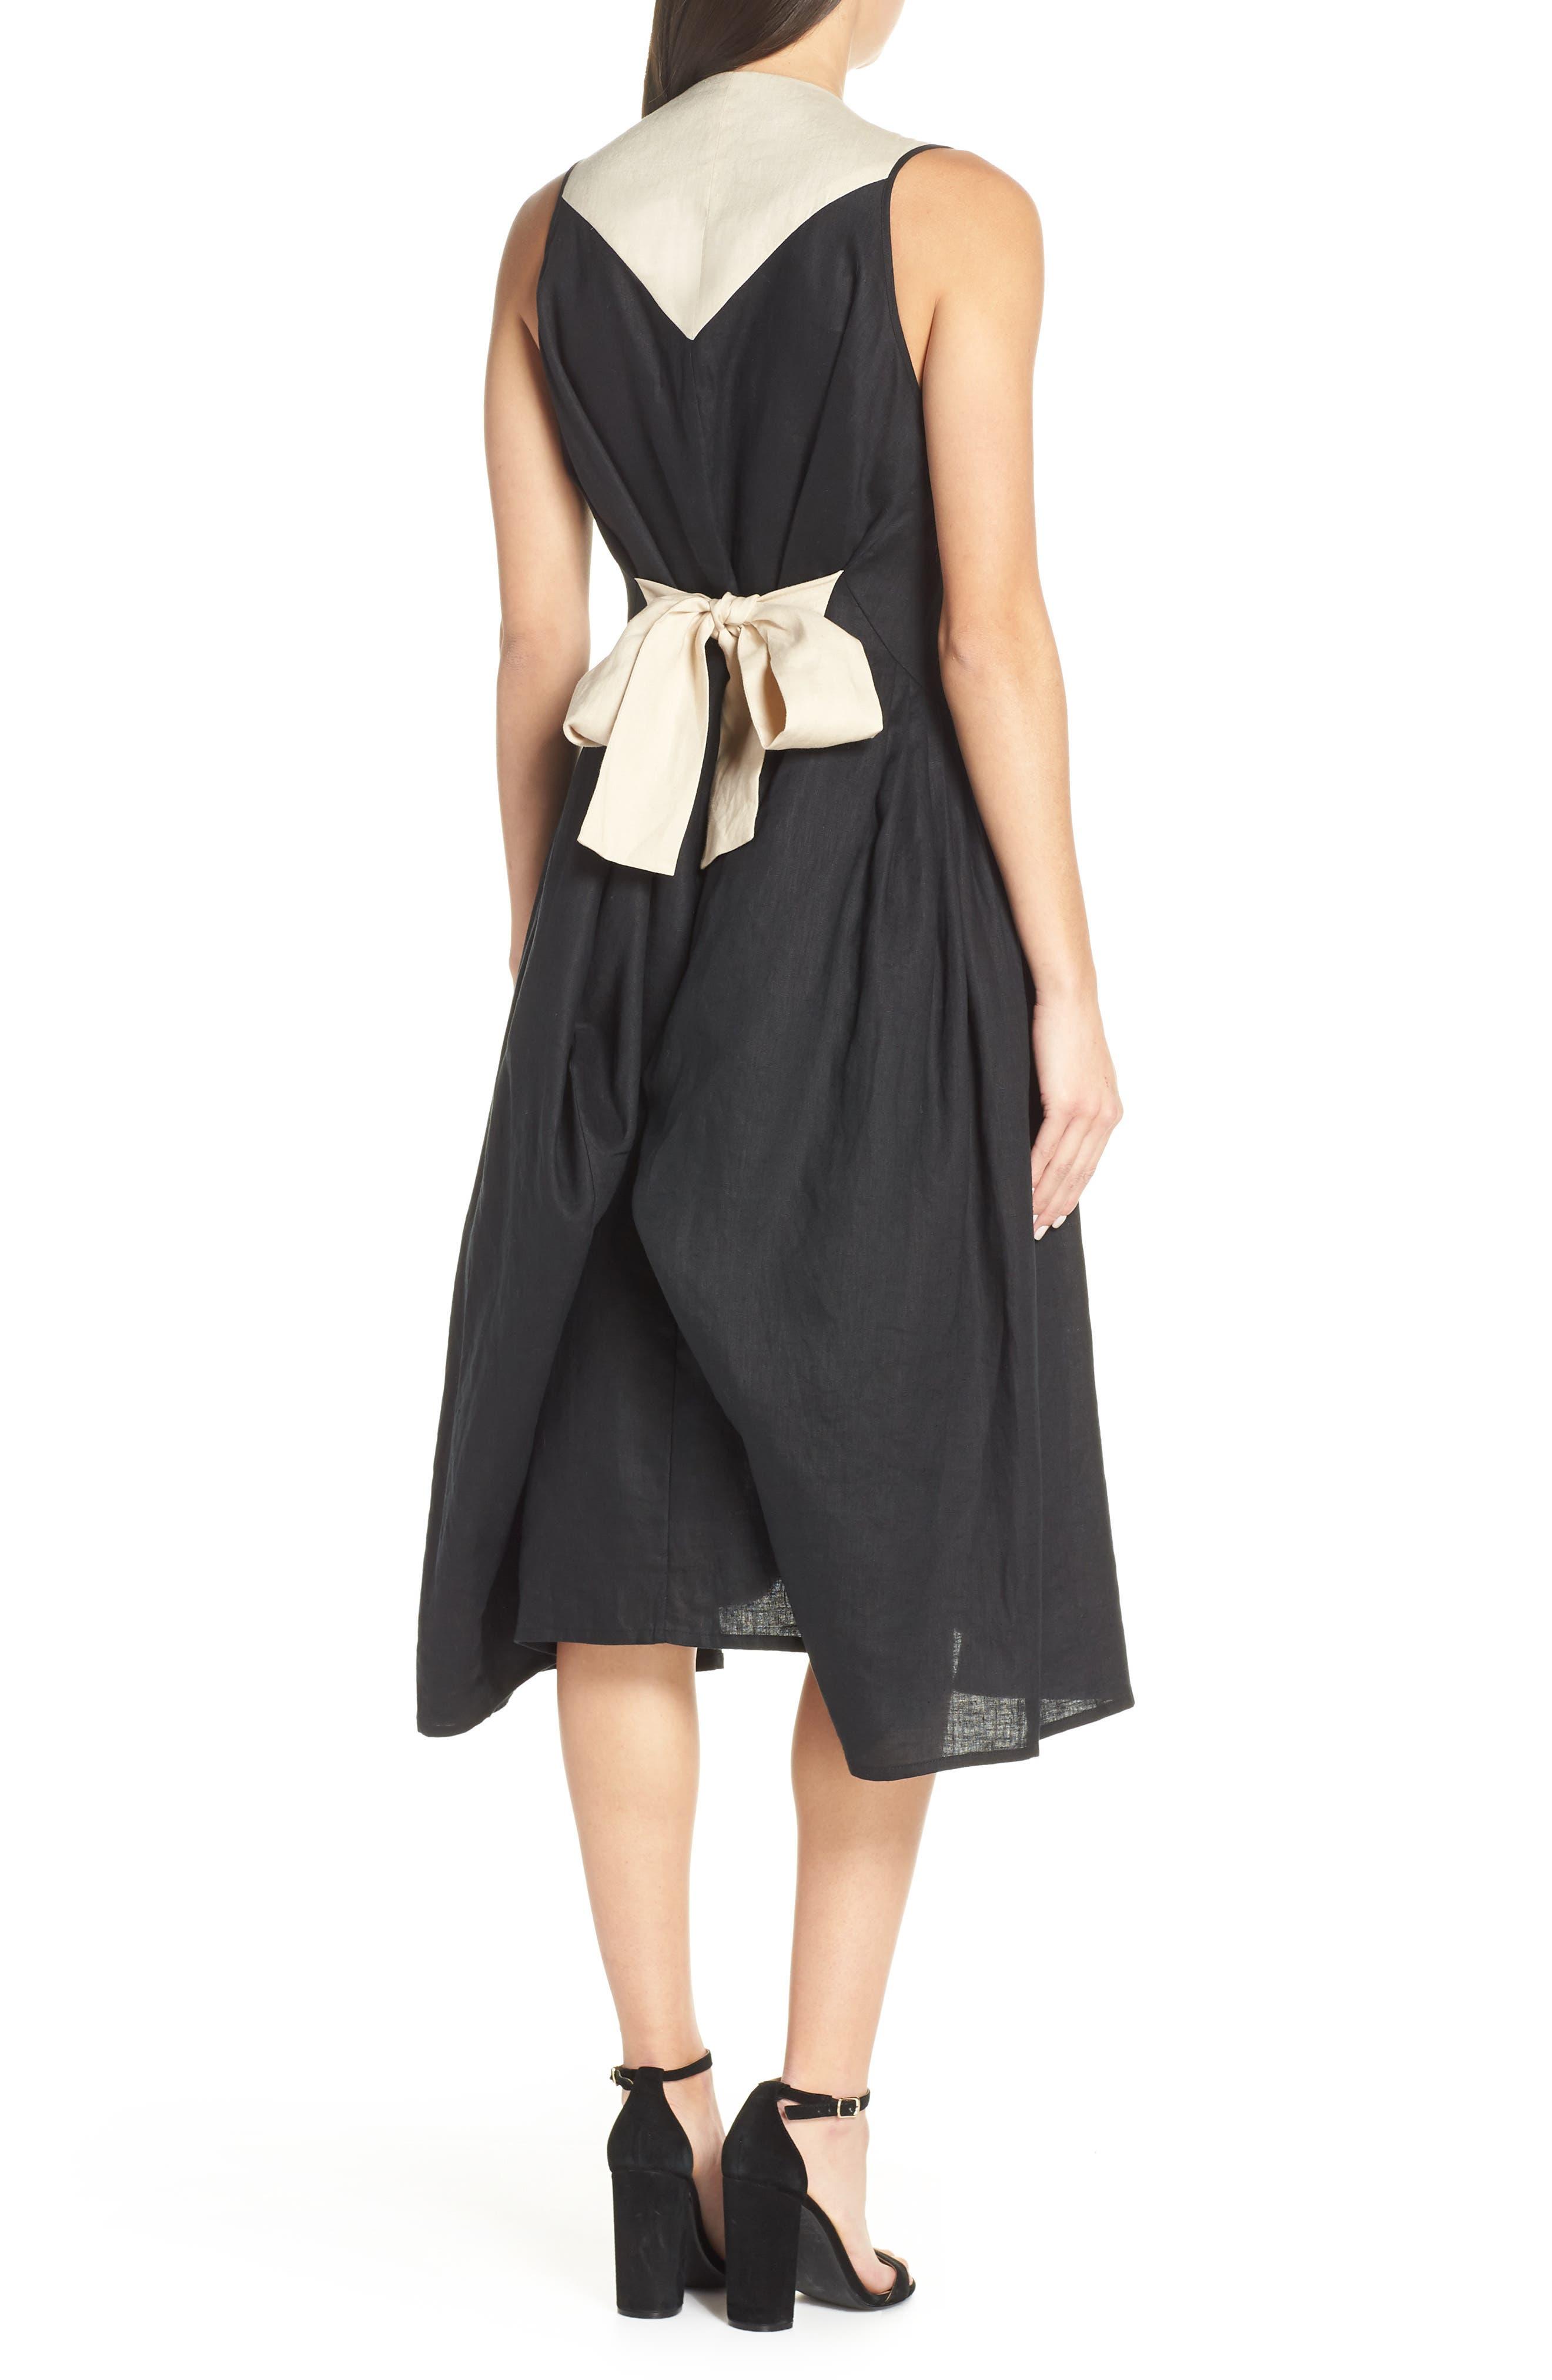 CAARA, Betha Colorblock Tie Back Dress, Alternate thumbnail 2, color, 001